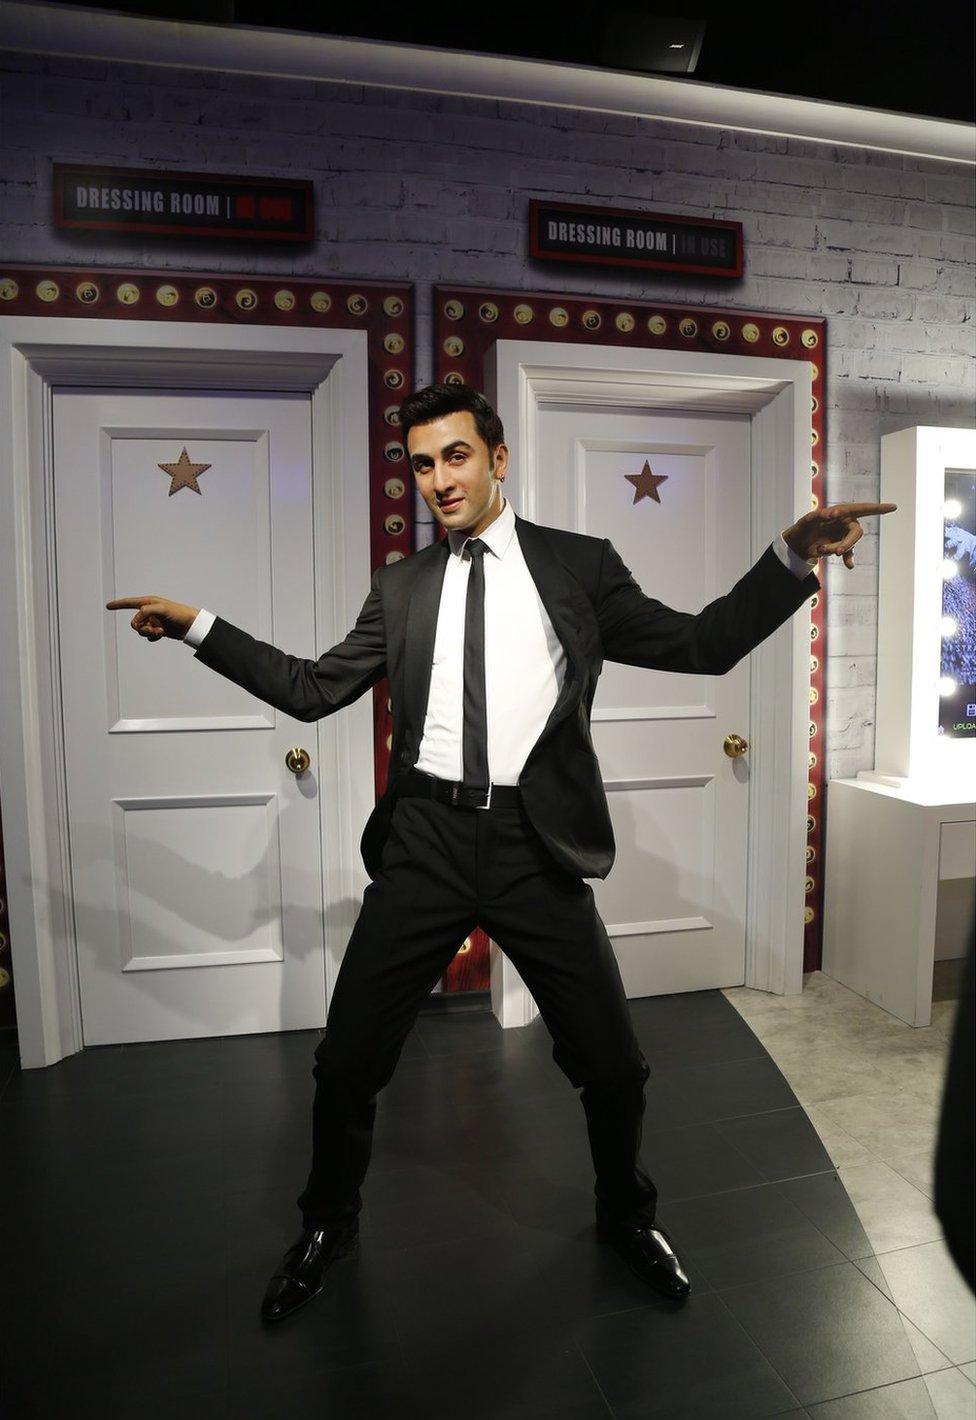 Bollywood actor Ranbir Kapoor's model